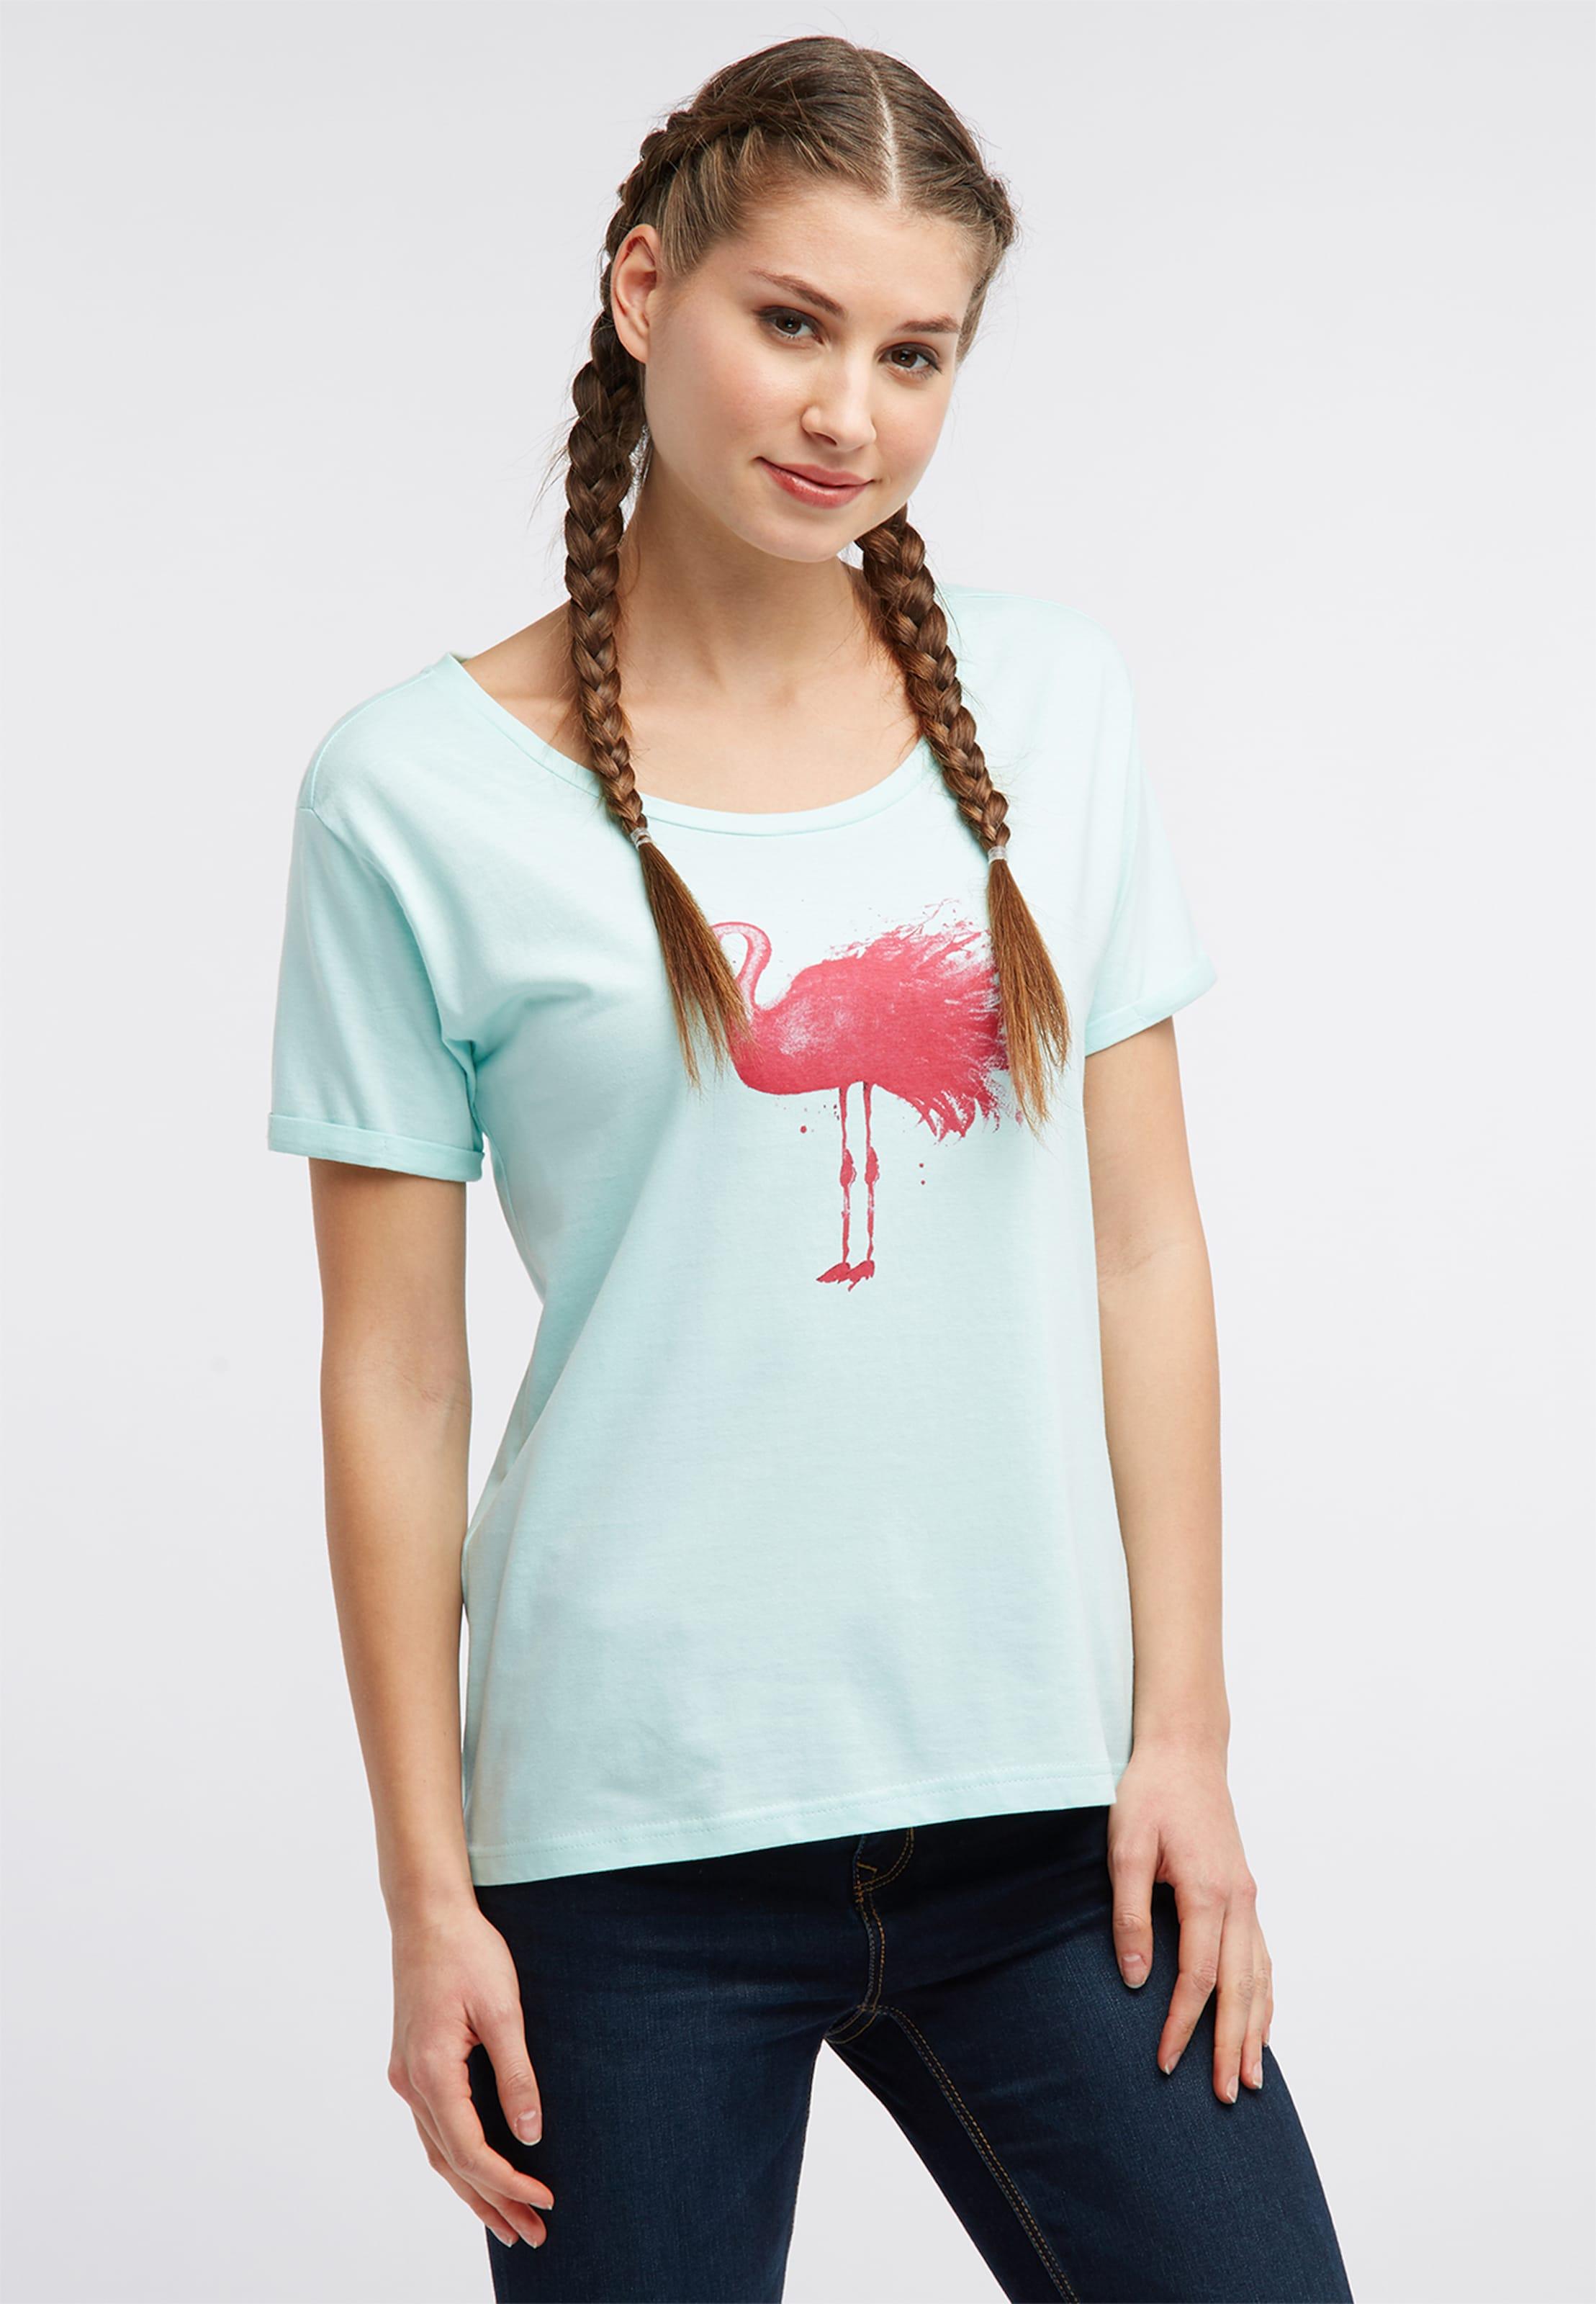 T shirt Mymo En ClairRouge Jaune 1cKlJTF